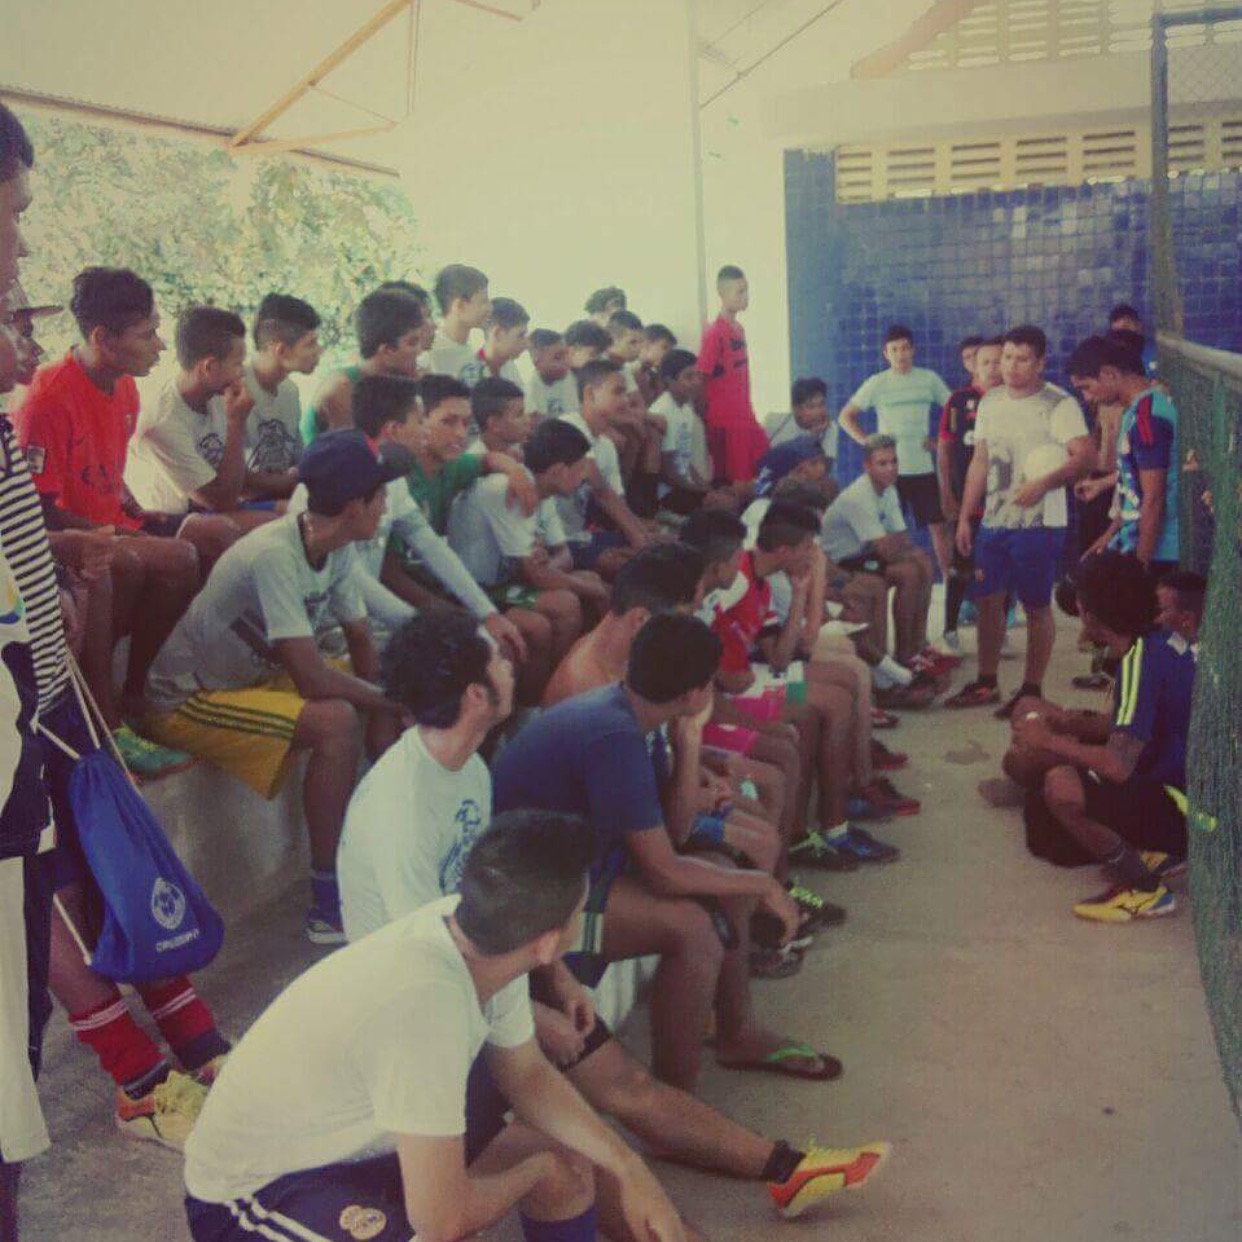 Amazon Soccer.JPG